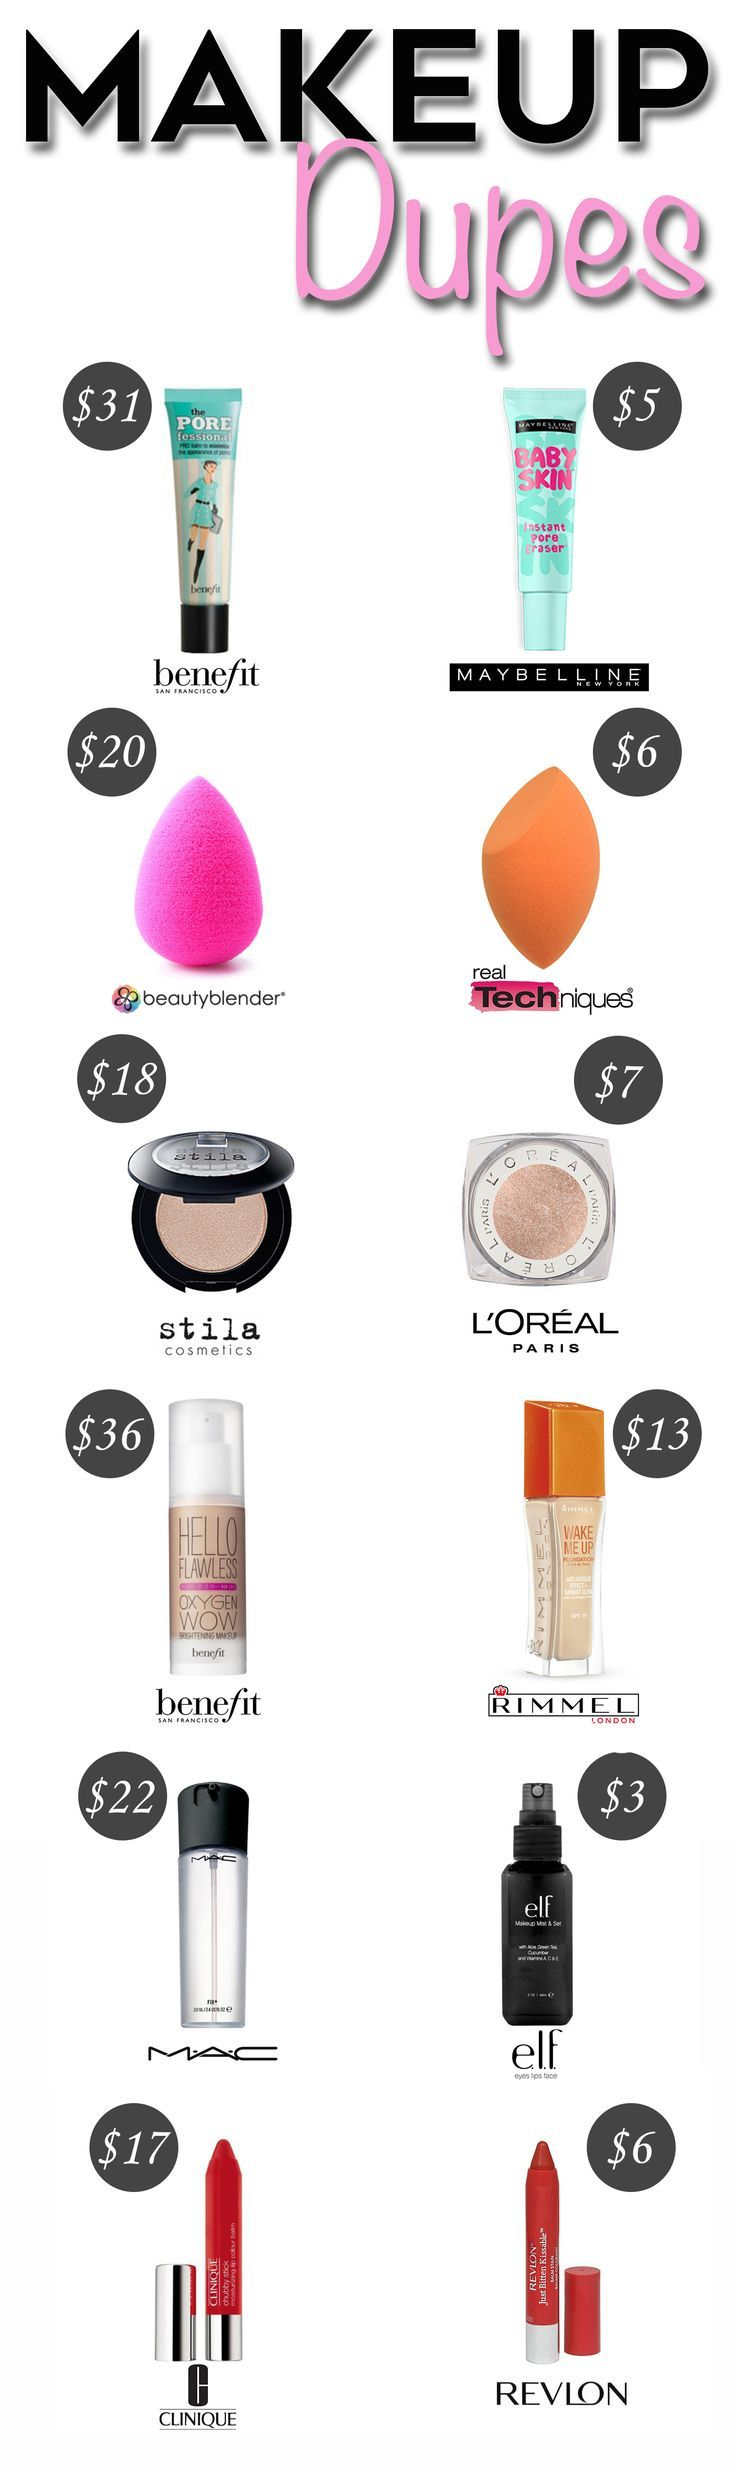 best natural look makeup images on pinterest beauty makeup